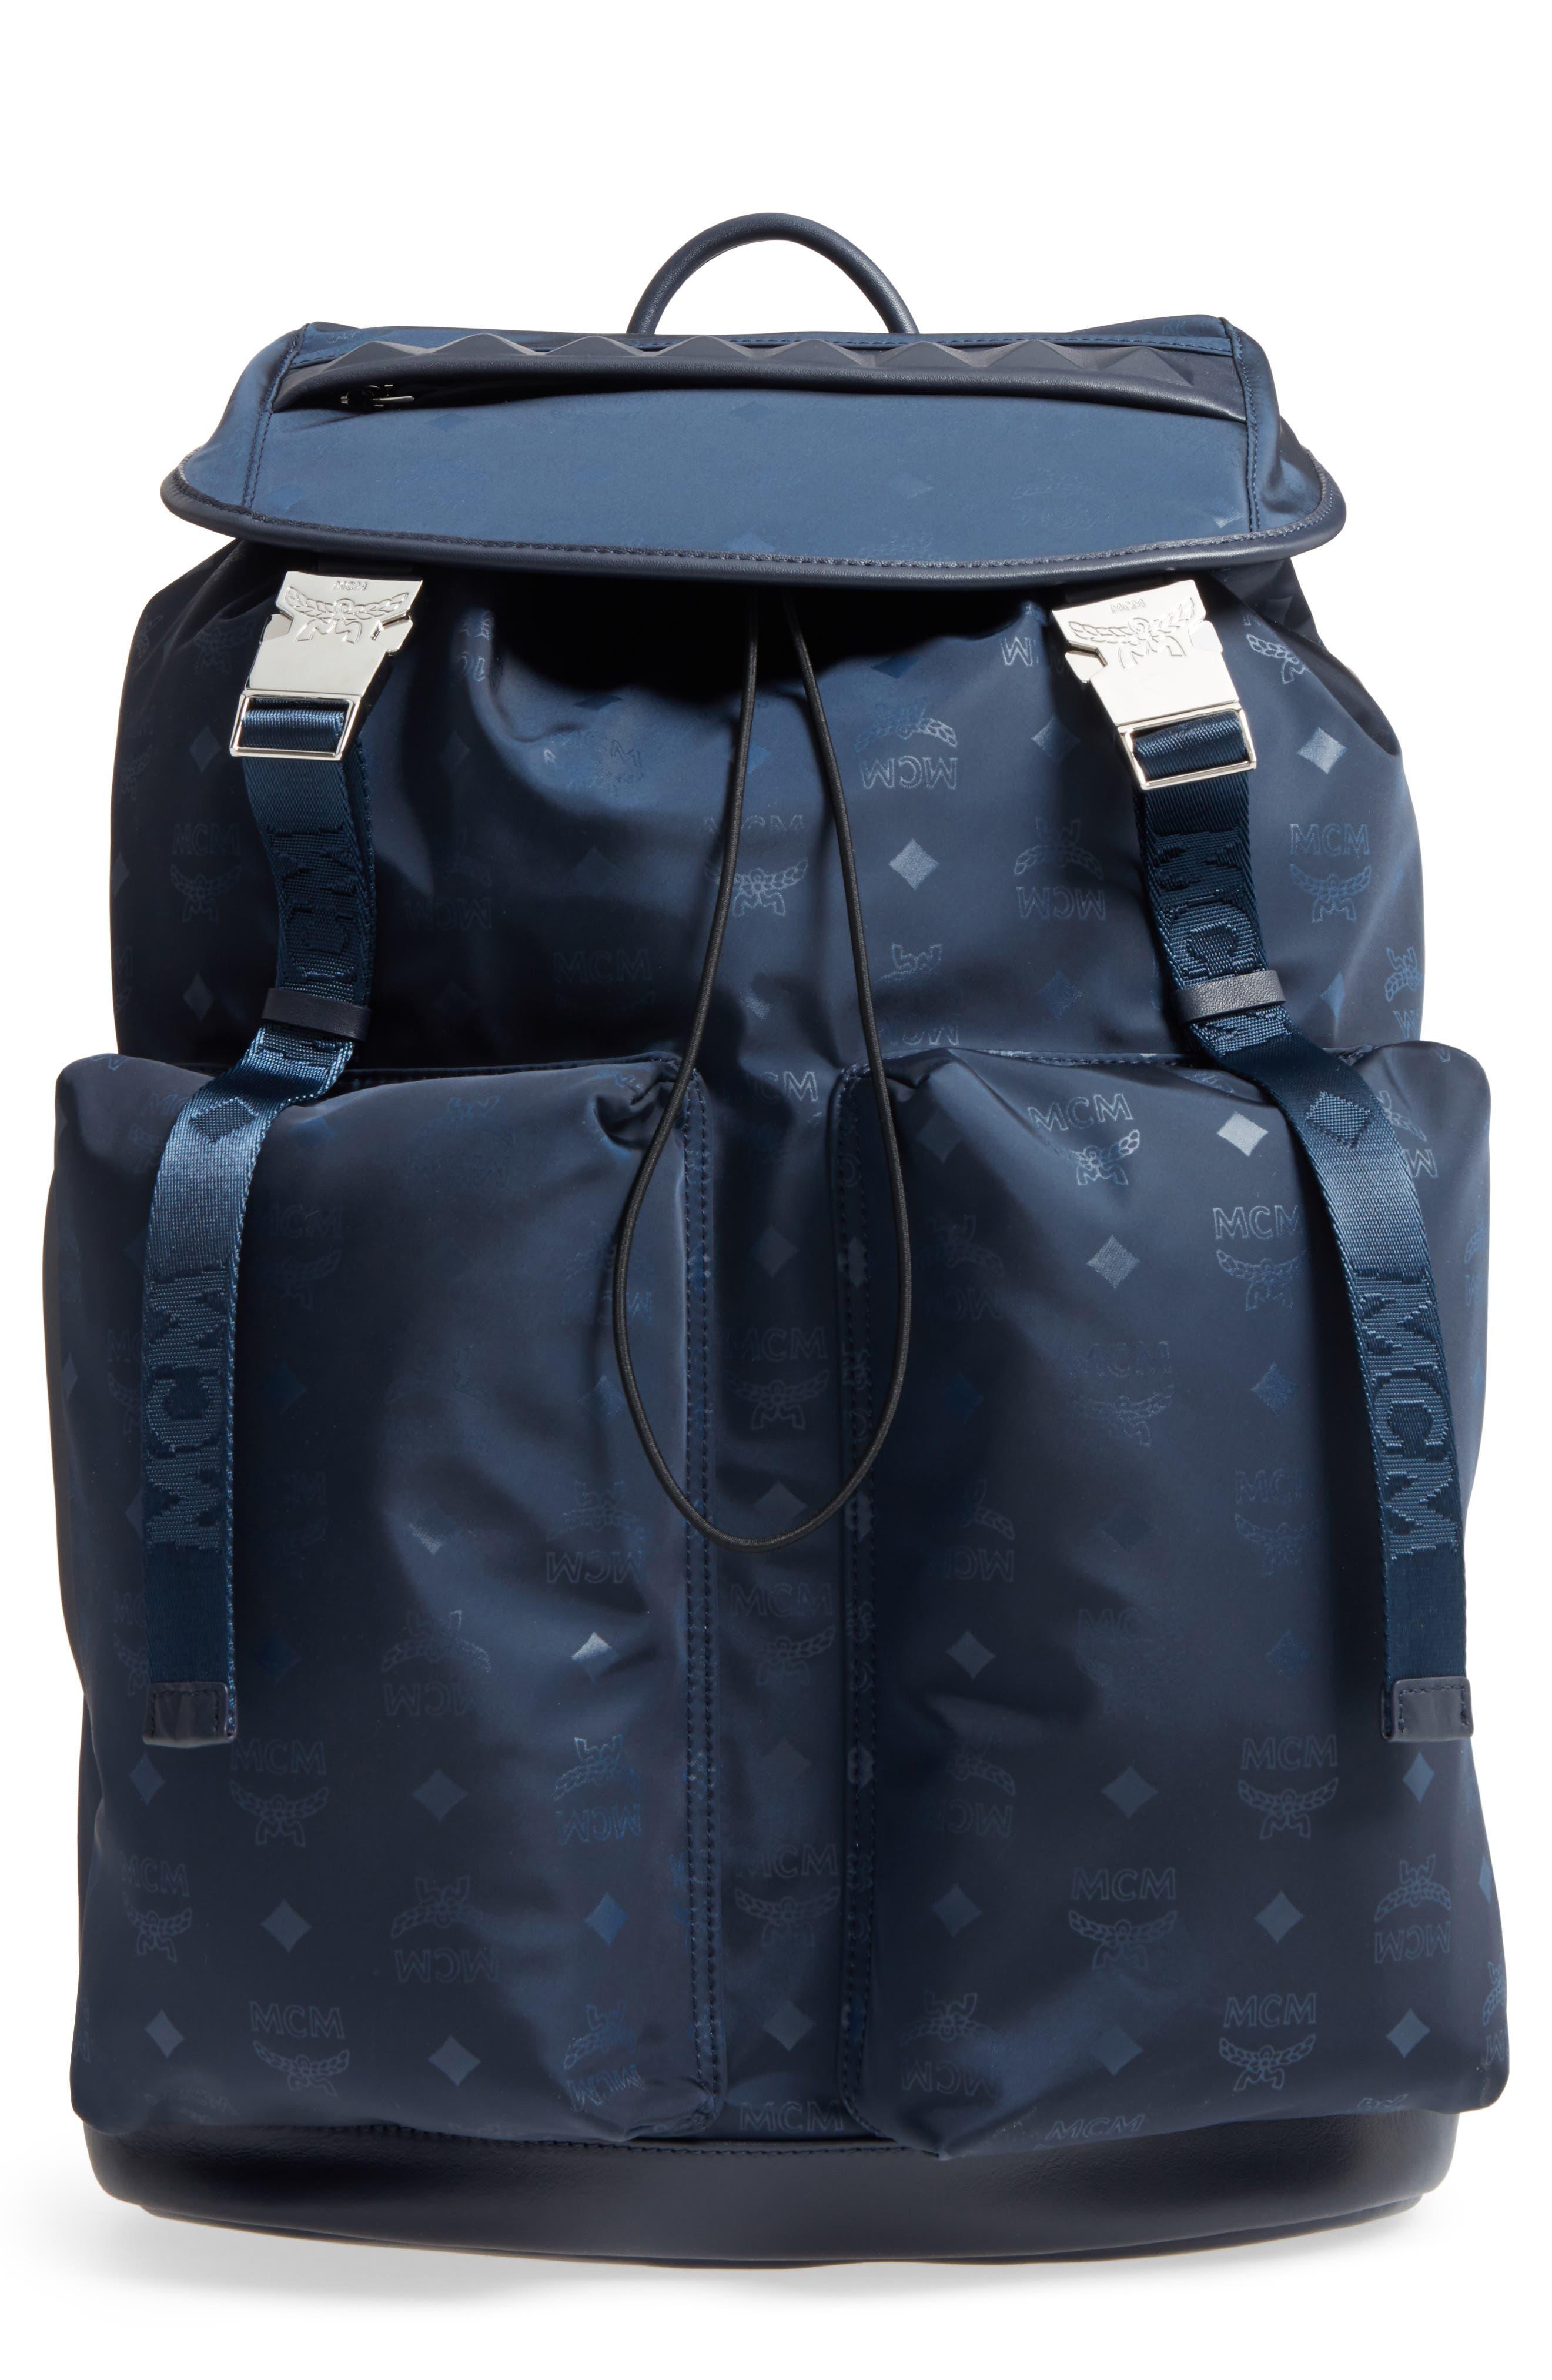 Dieter Backpack,                             Main thumbnail 1, color,                             NAVY BLUE